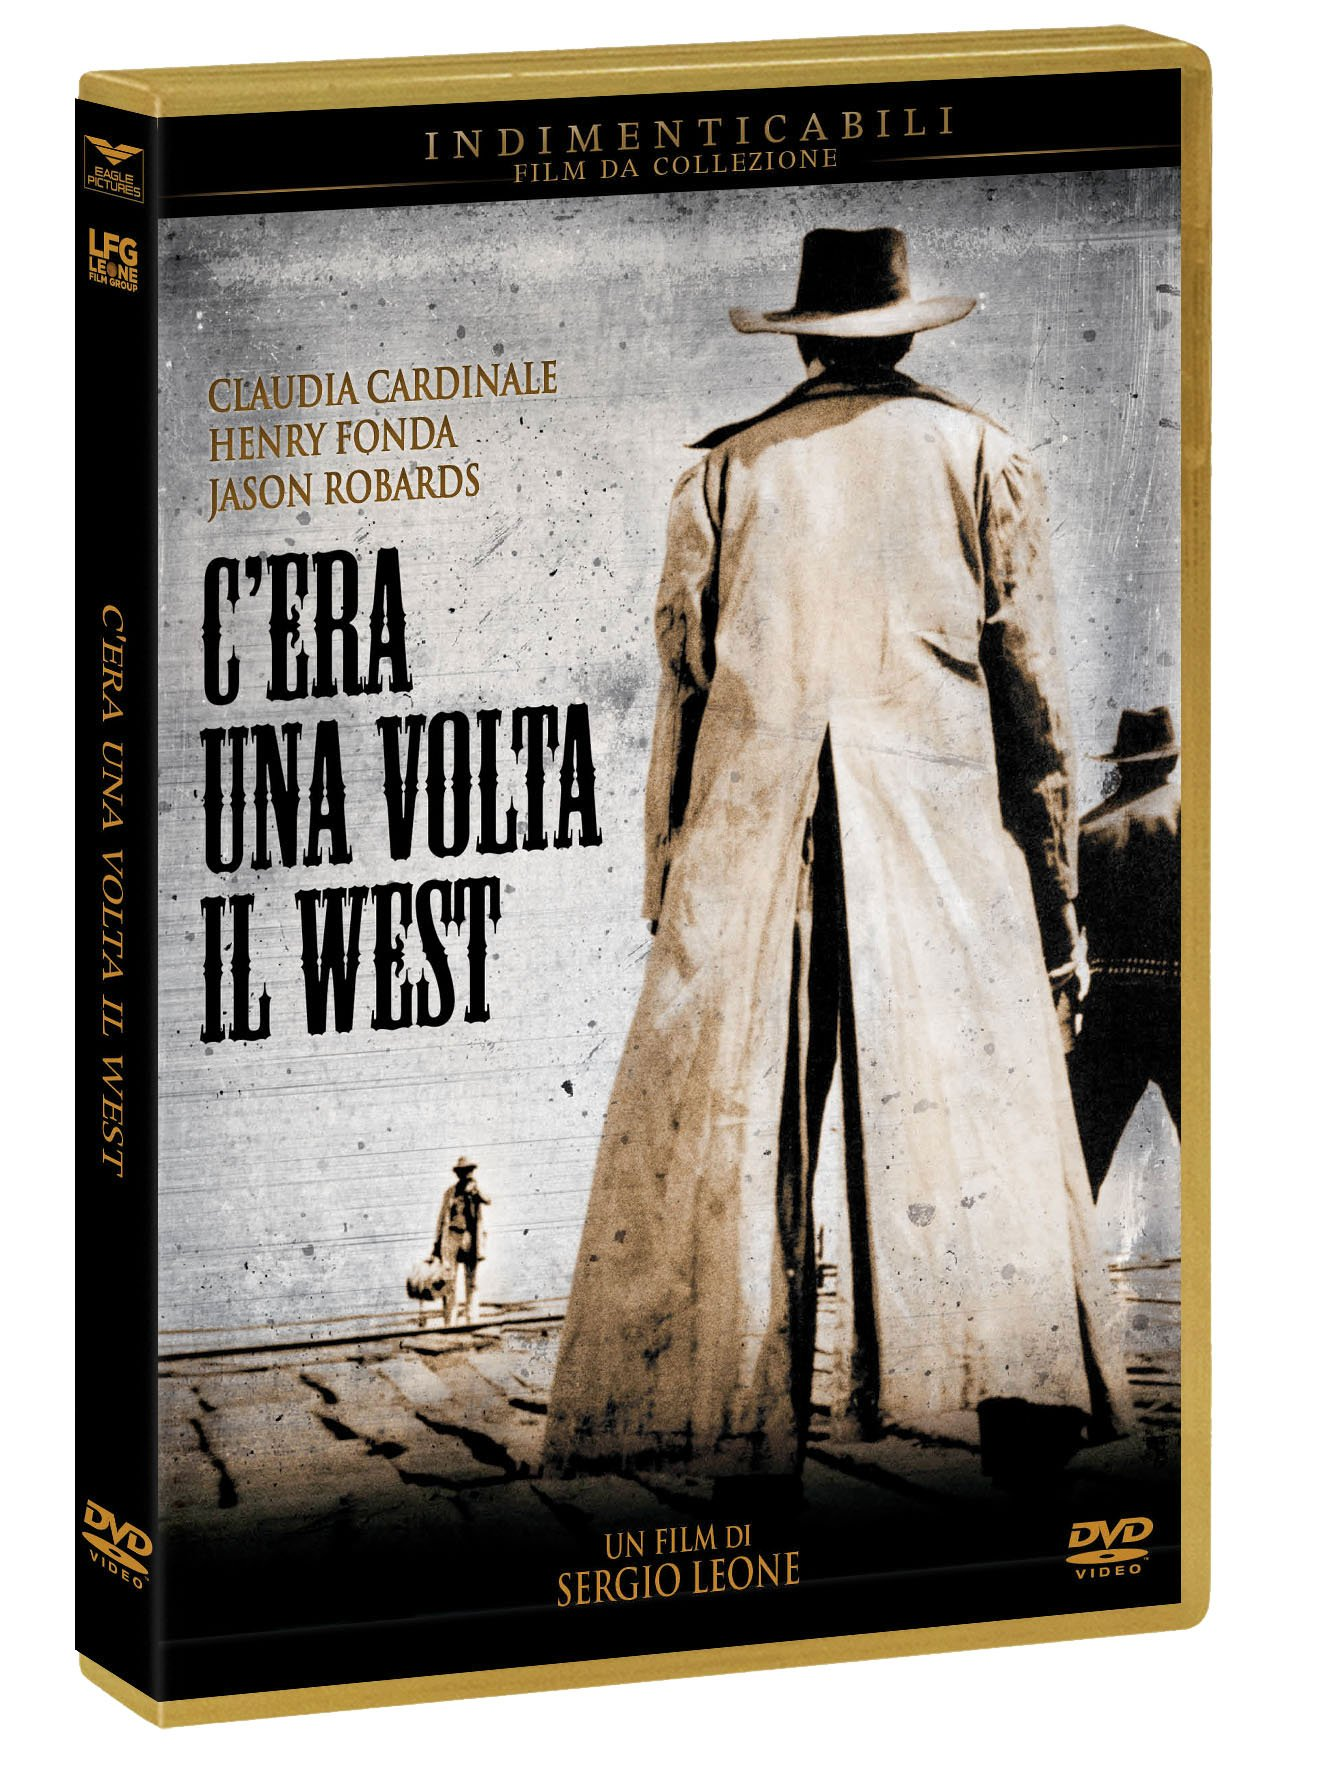 C'ERA UNA VOLTA IL WEST (INDIMENTICABILI) (DVD)